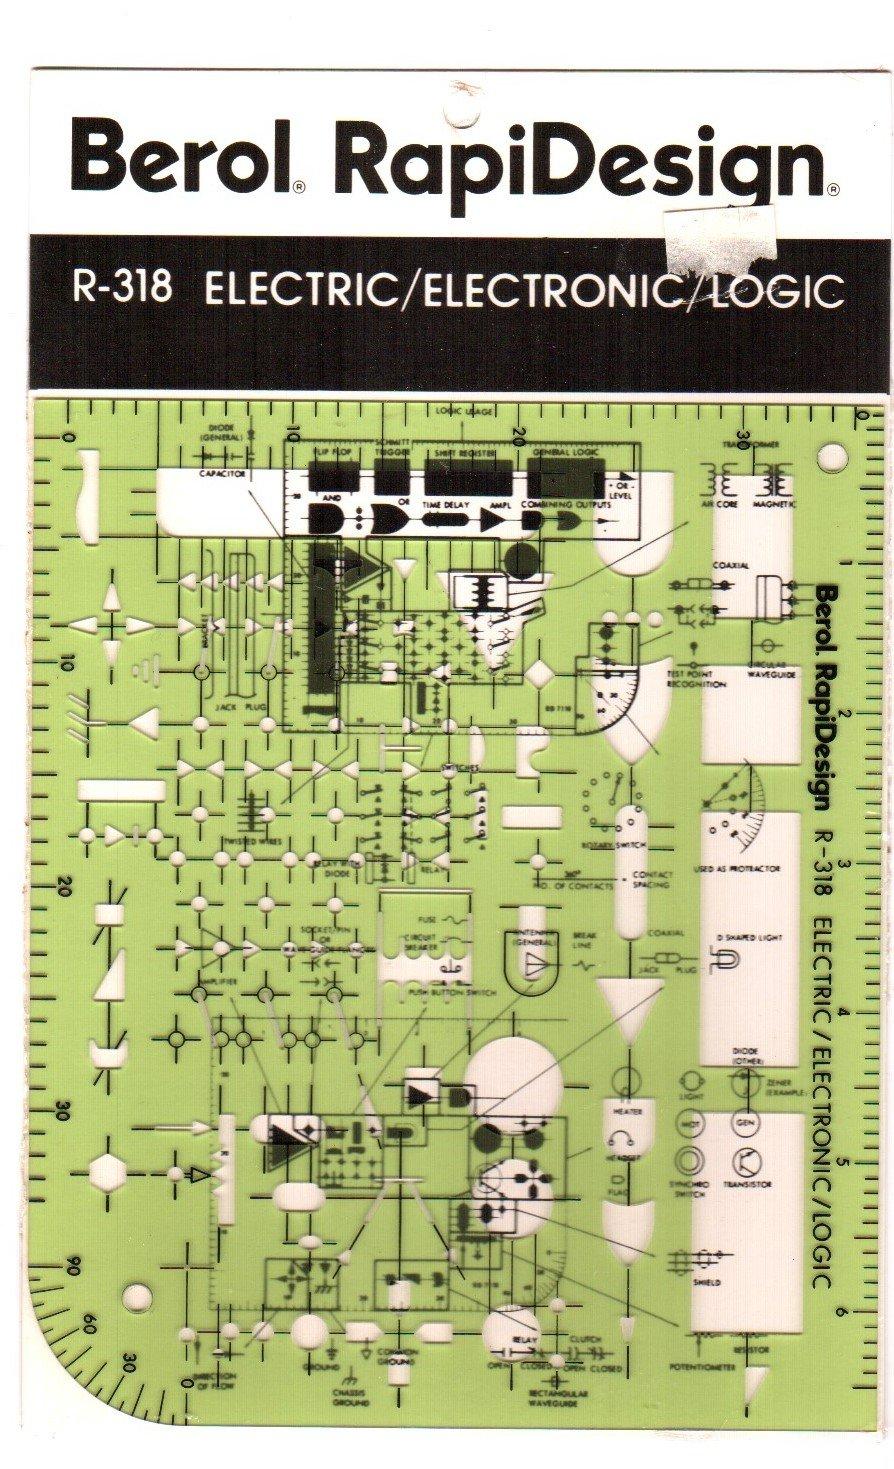 Berol, RapiDesign, R-318, Electric/Electronic/Logic